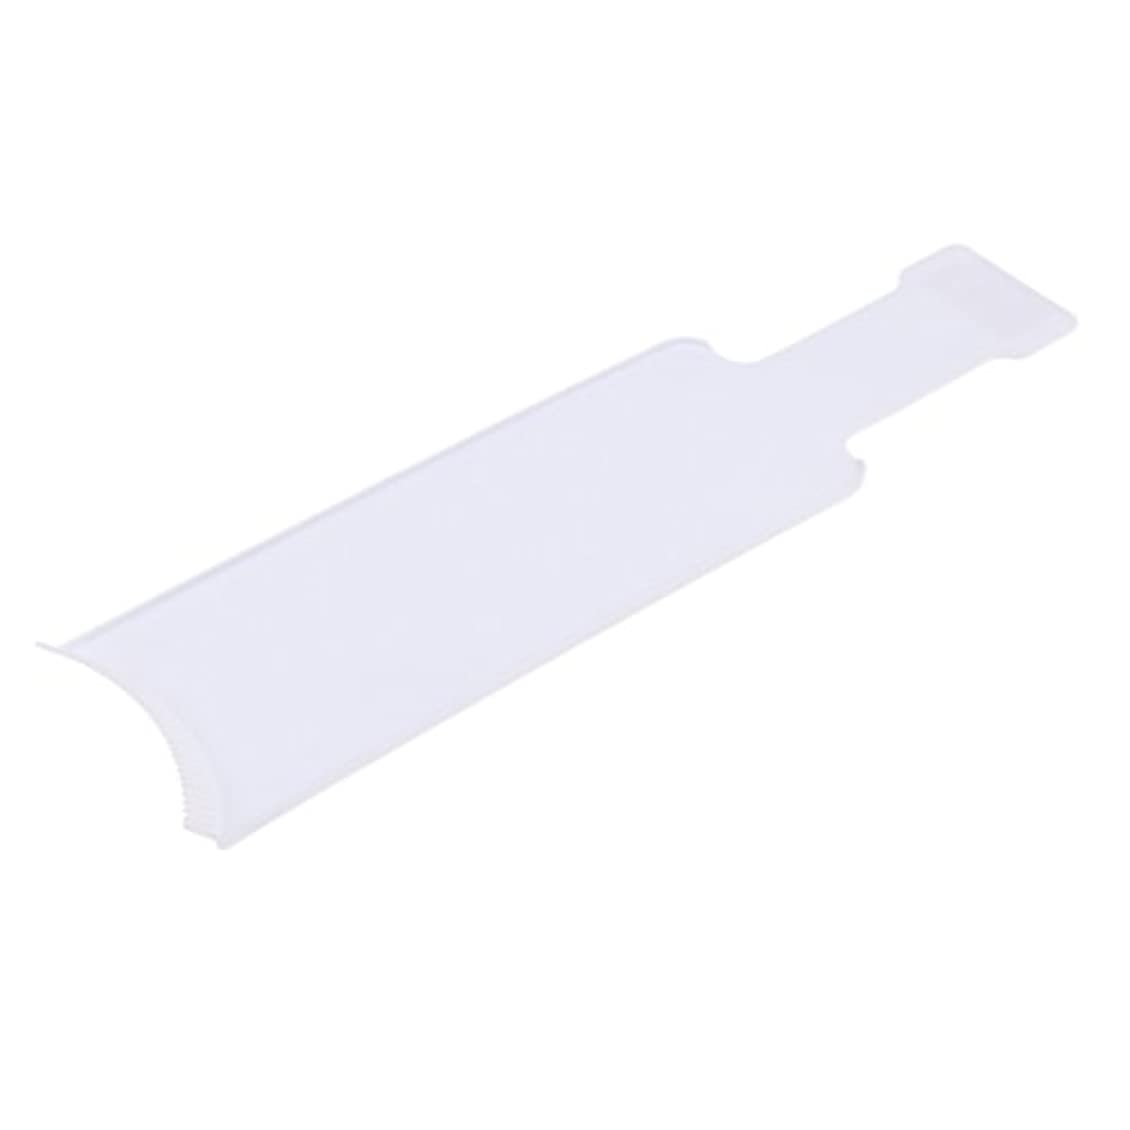 Homyl 染色櫛プレート 着色ボード 染めボード ヘアカラー ヘアブラシ 便利 おしゃれ染 2サイズ2色選べる - L, 白